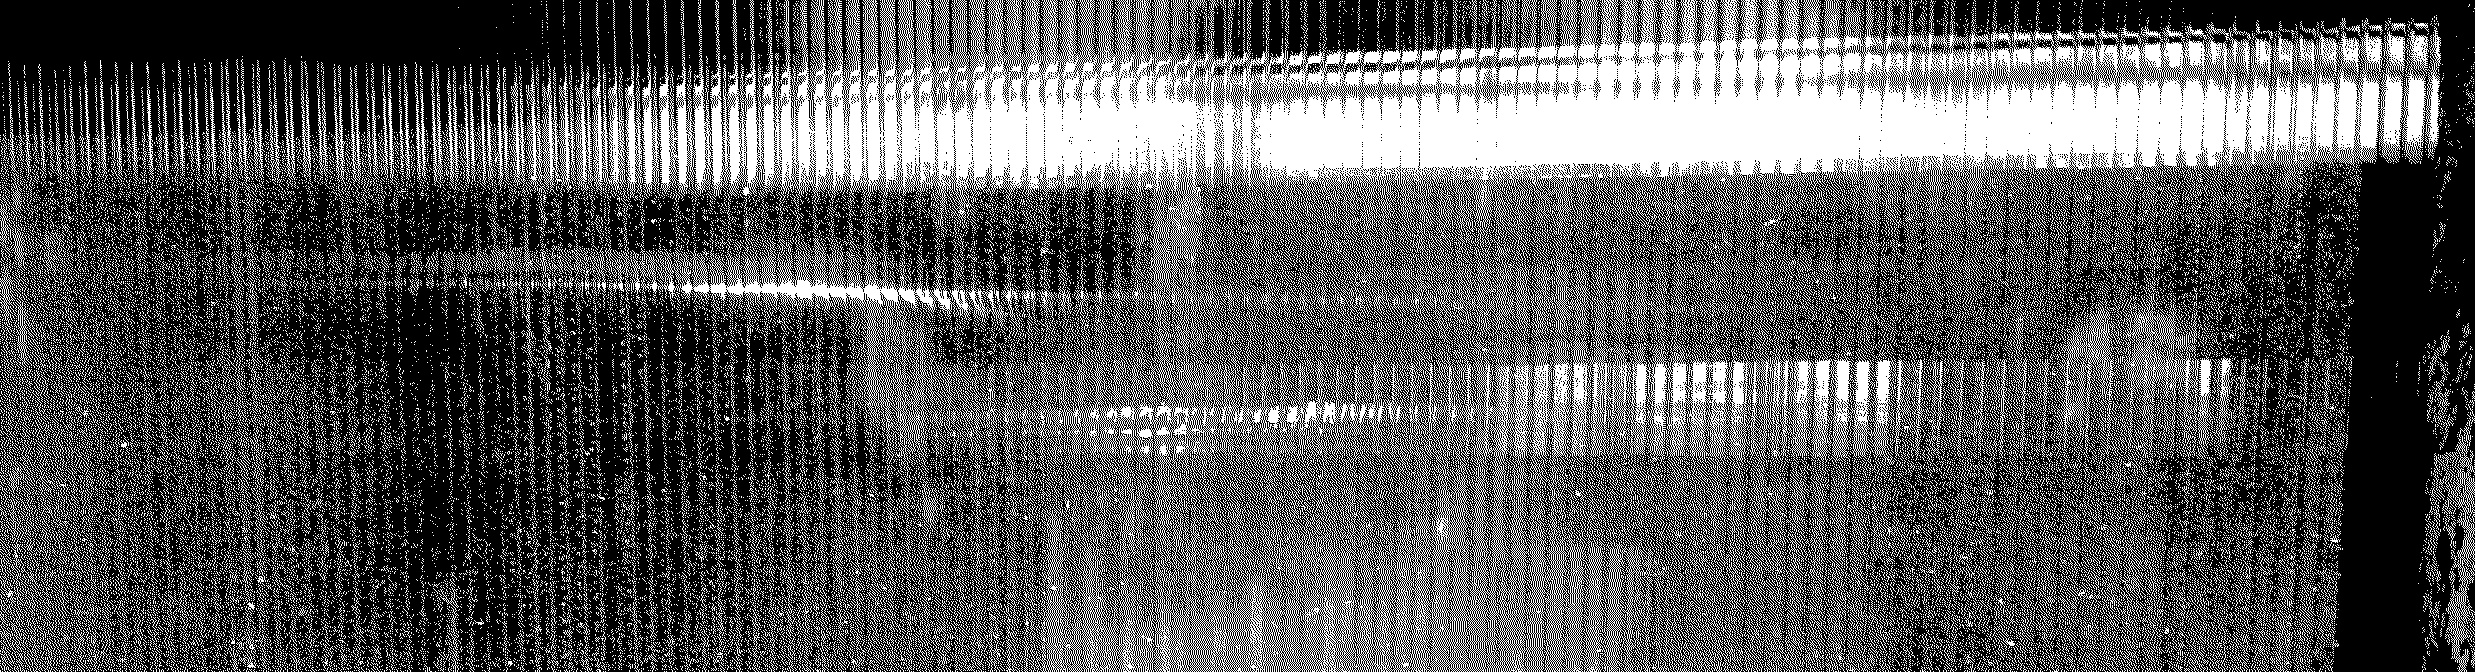 img/texturas/Foto 17-10-12 11 12 18.jpg